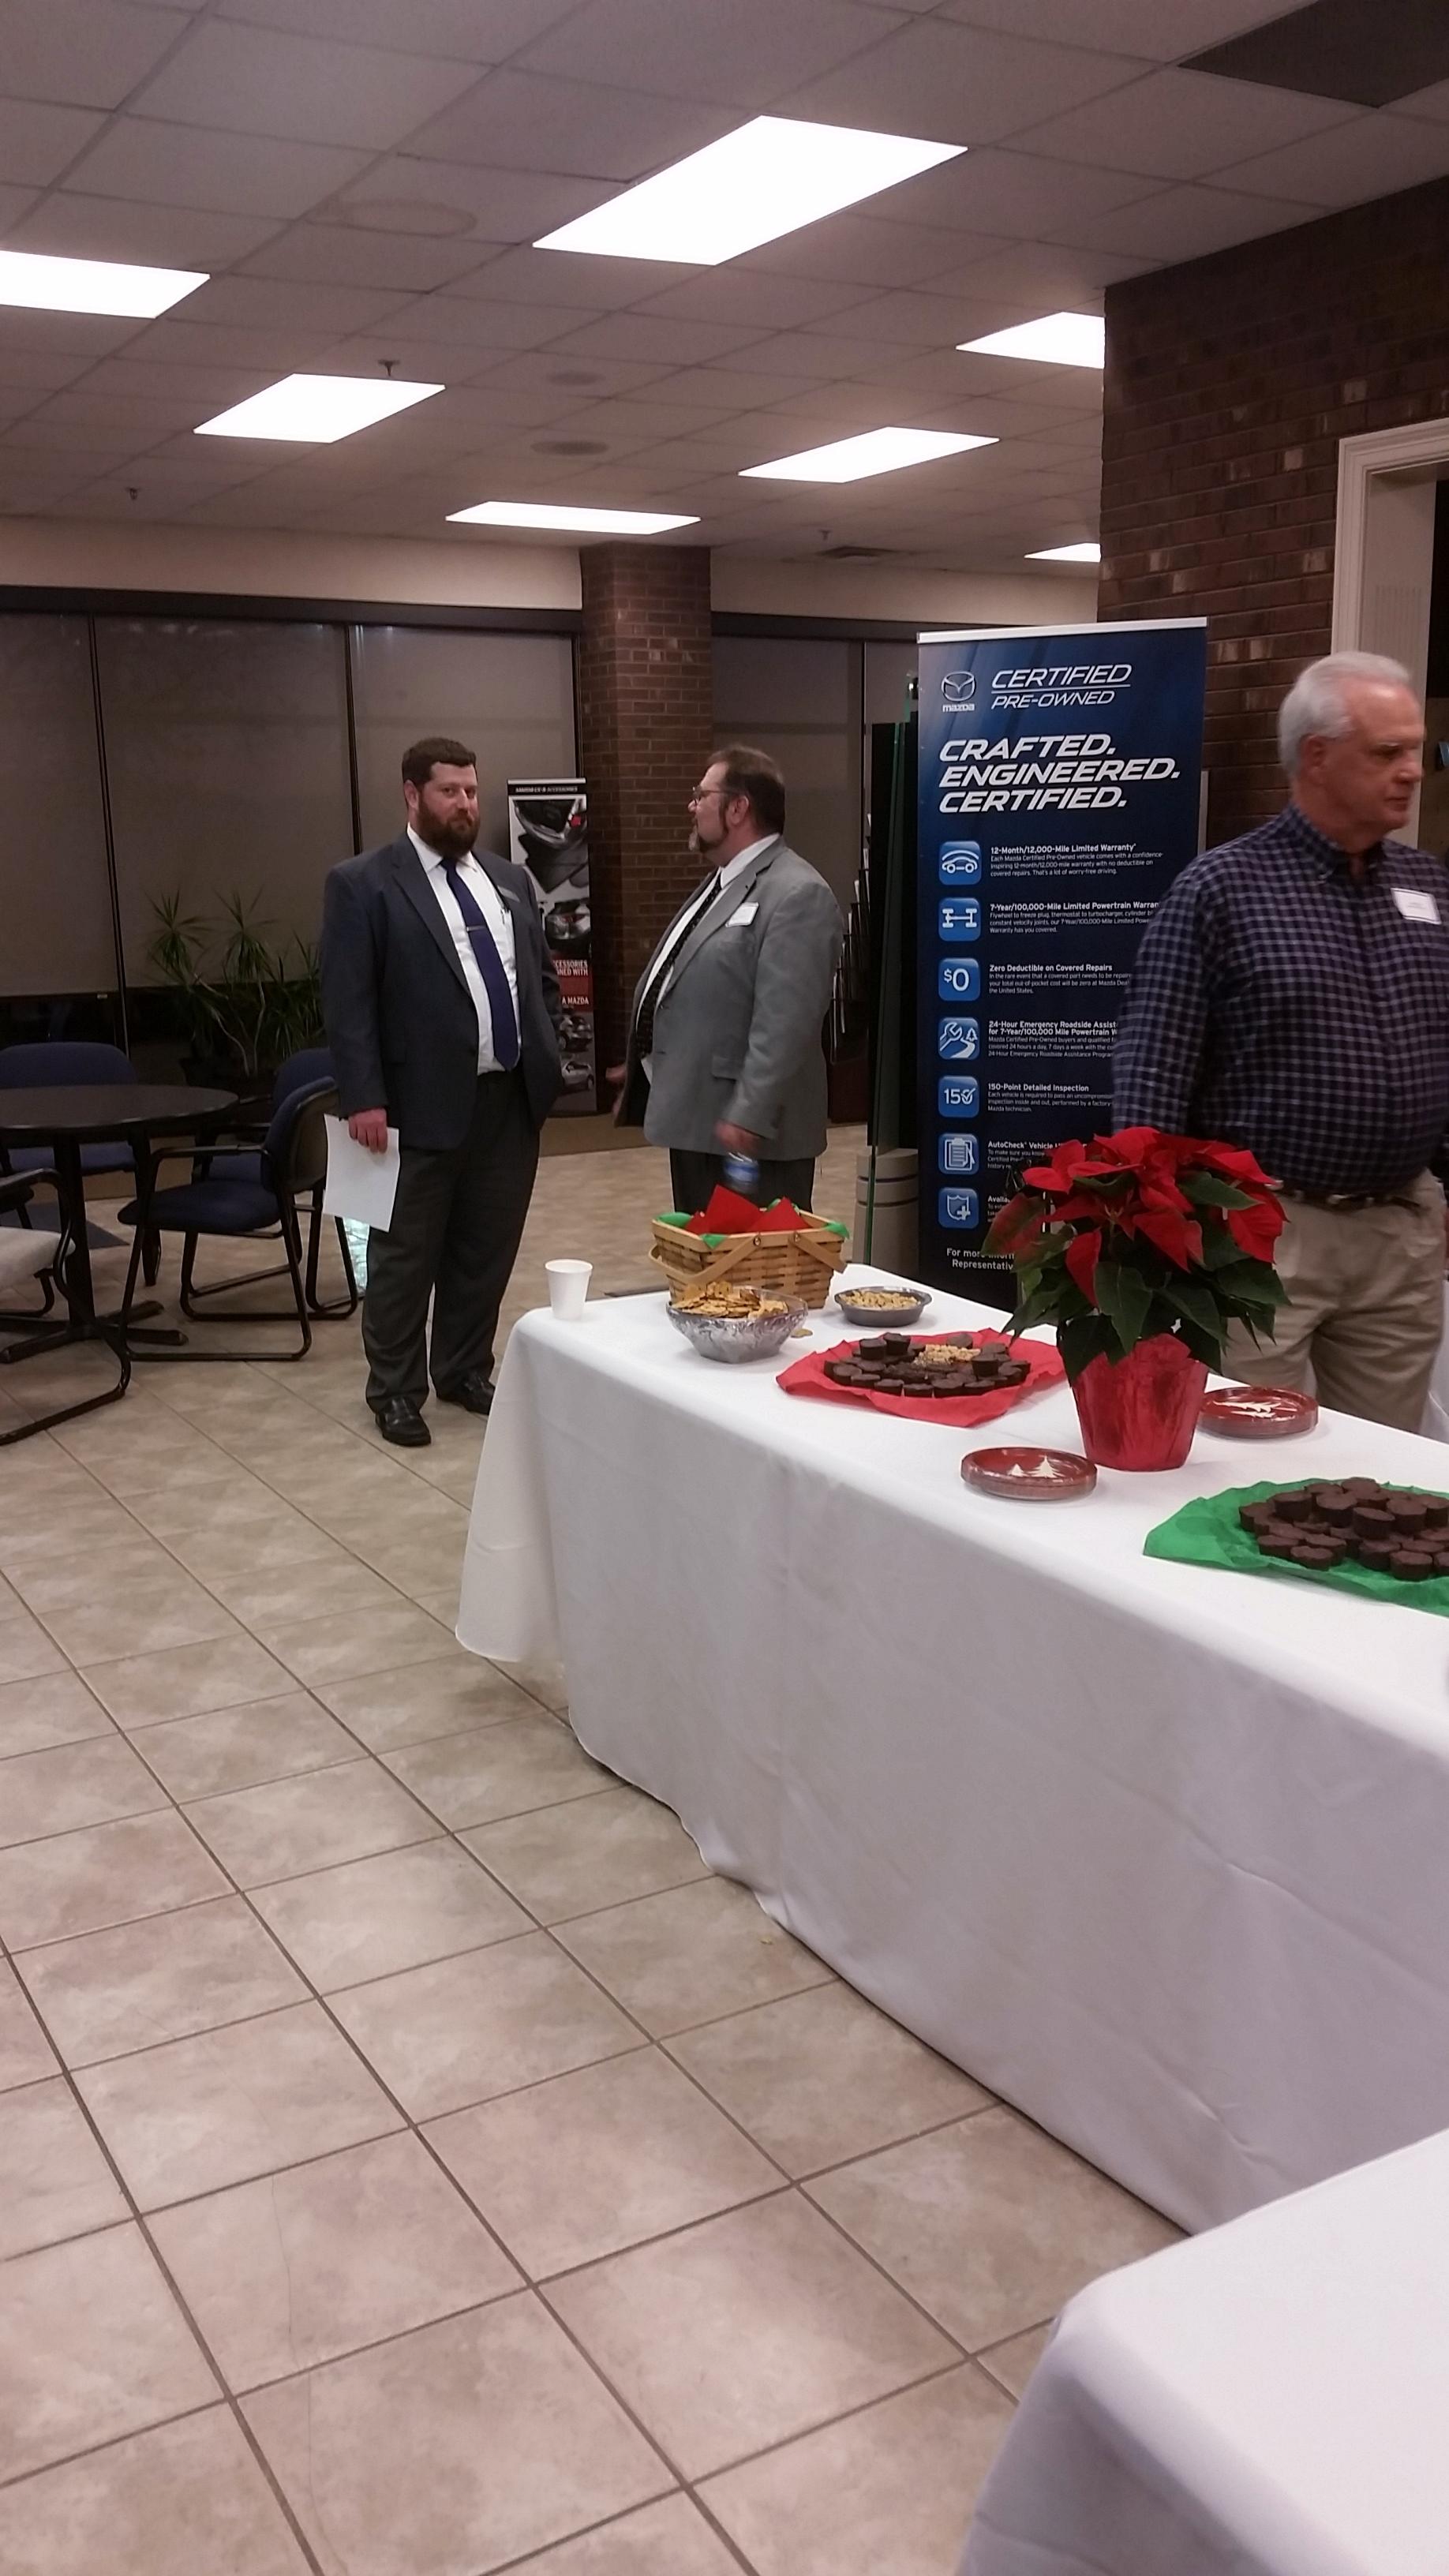 Lawyers attend regional kentucky event